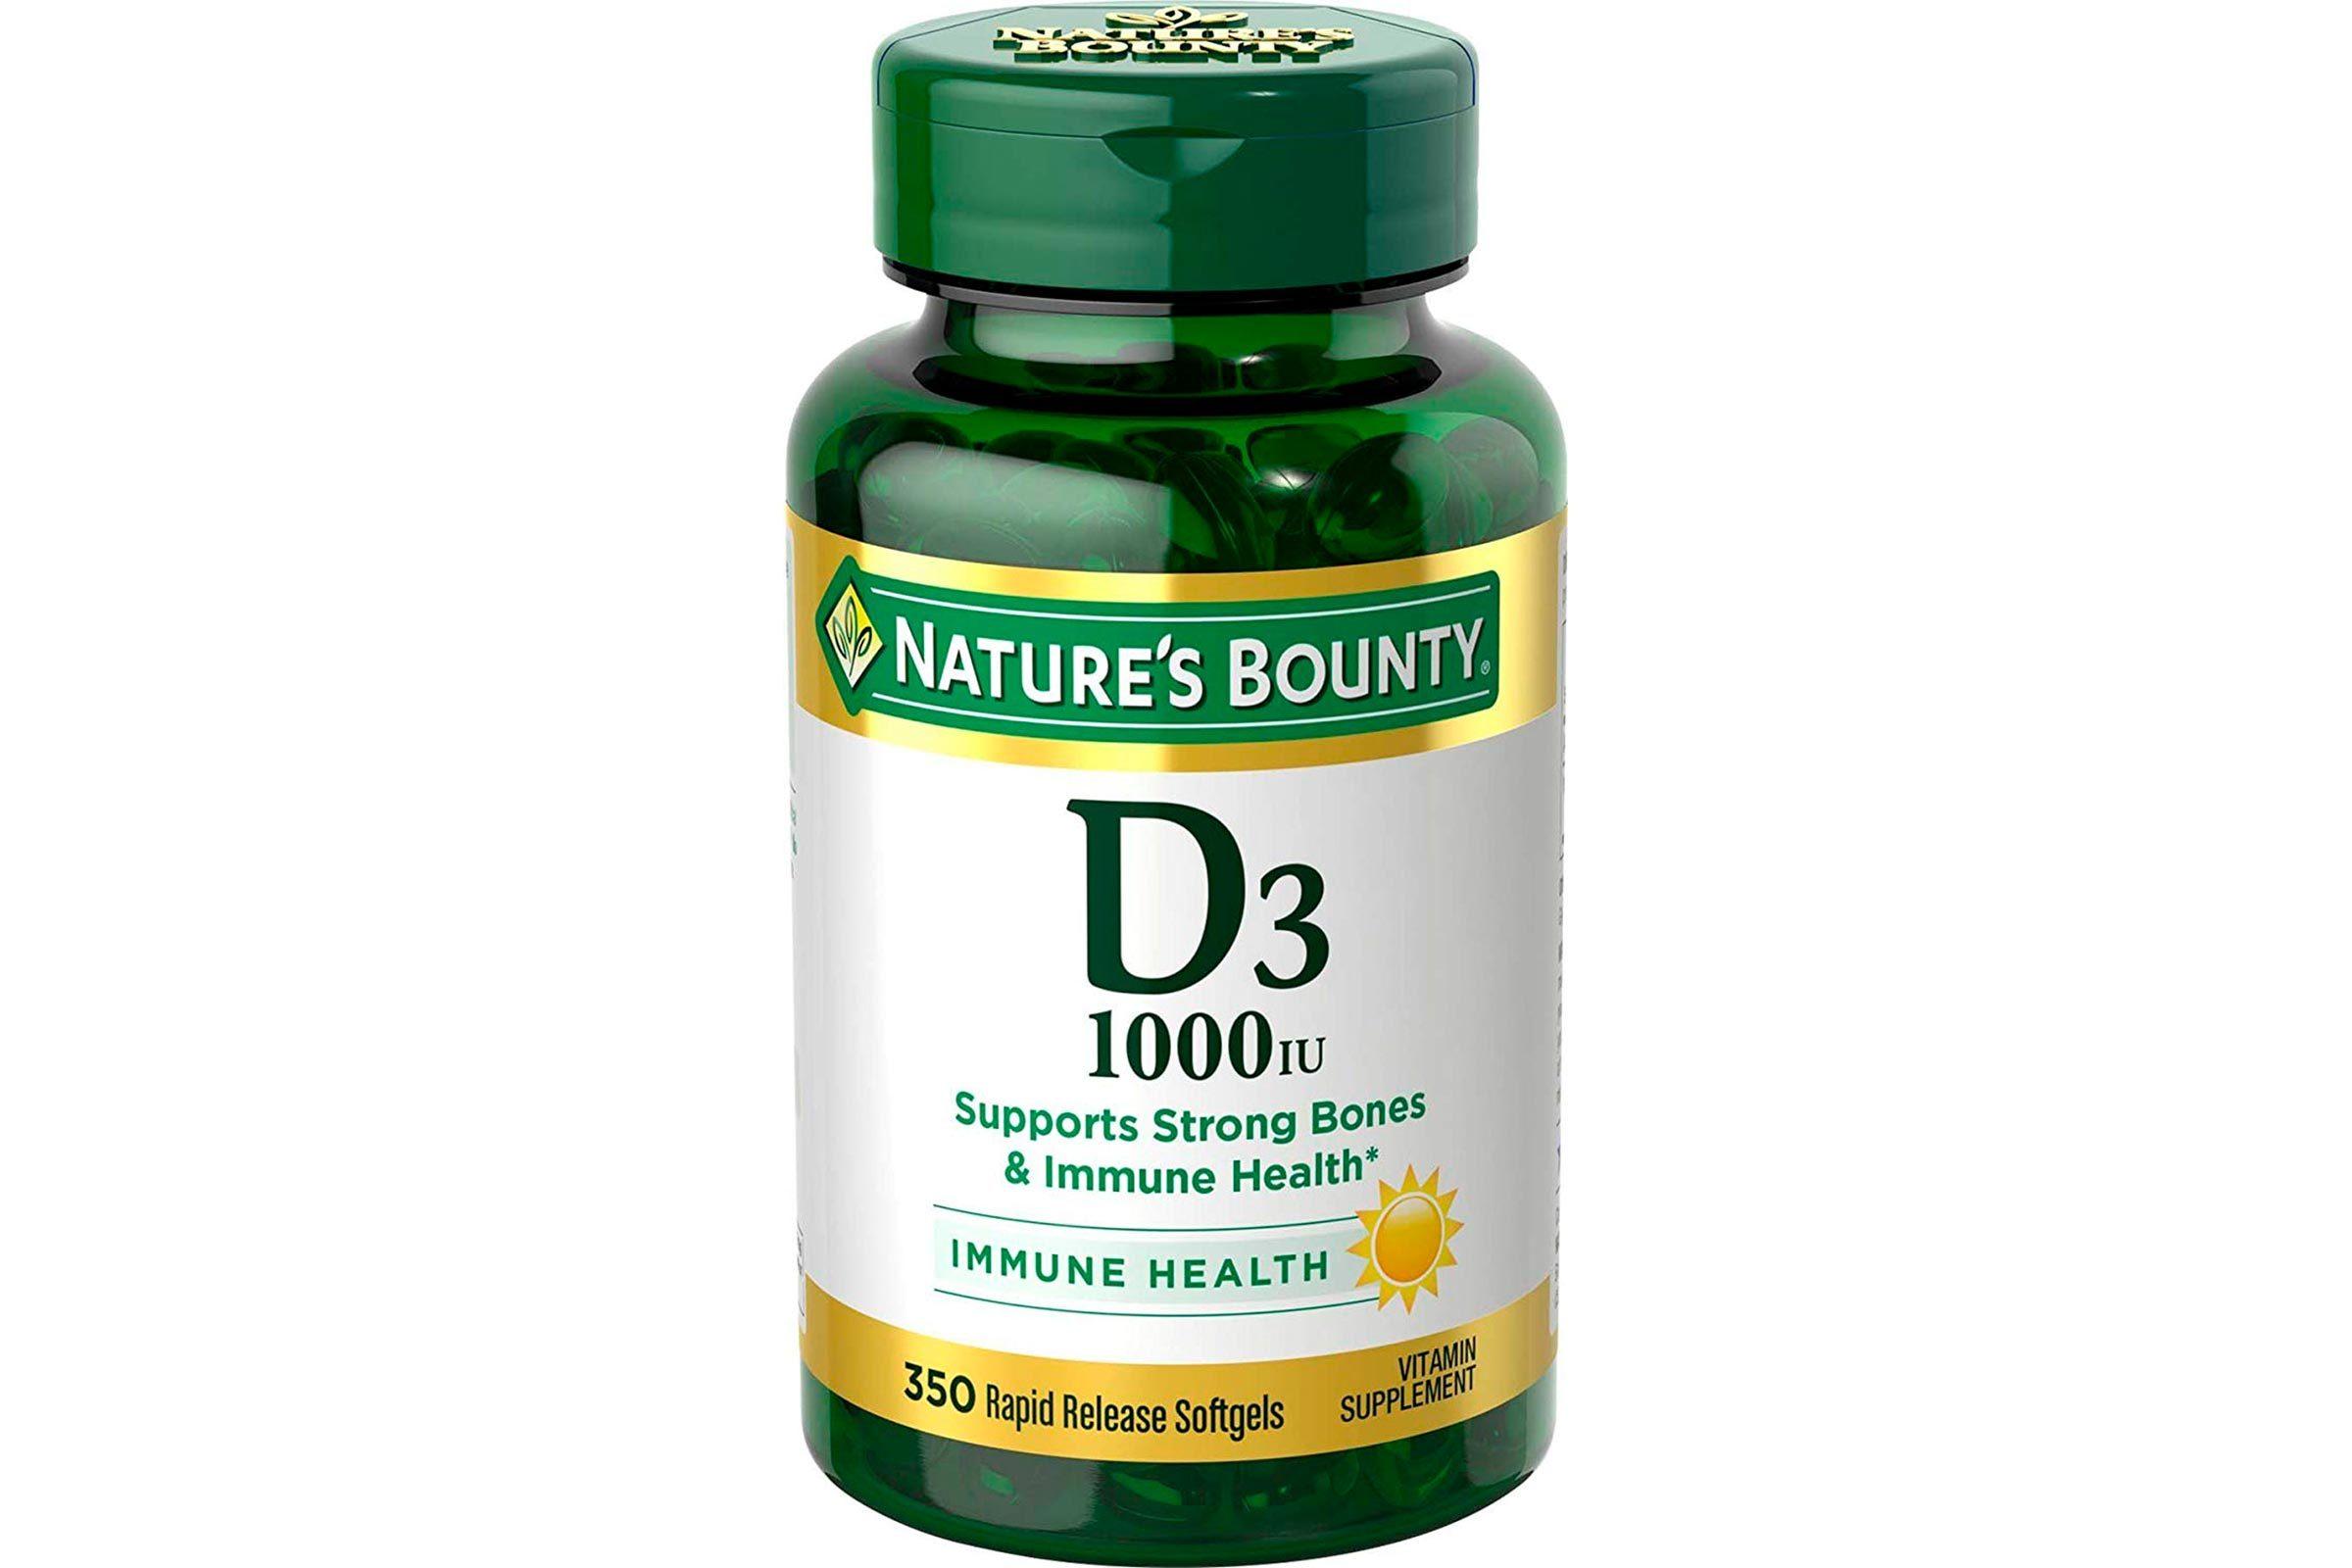 vitamin d oxidative stress immunity and aging